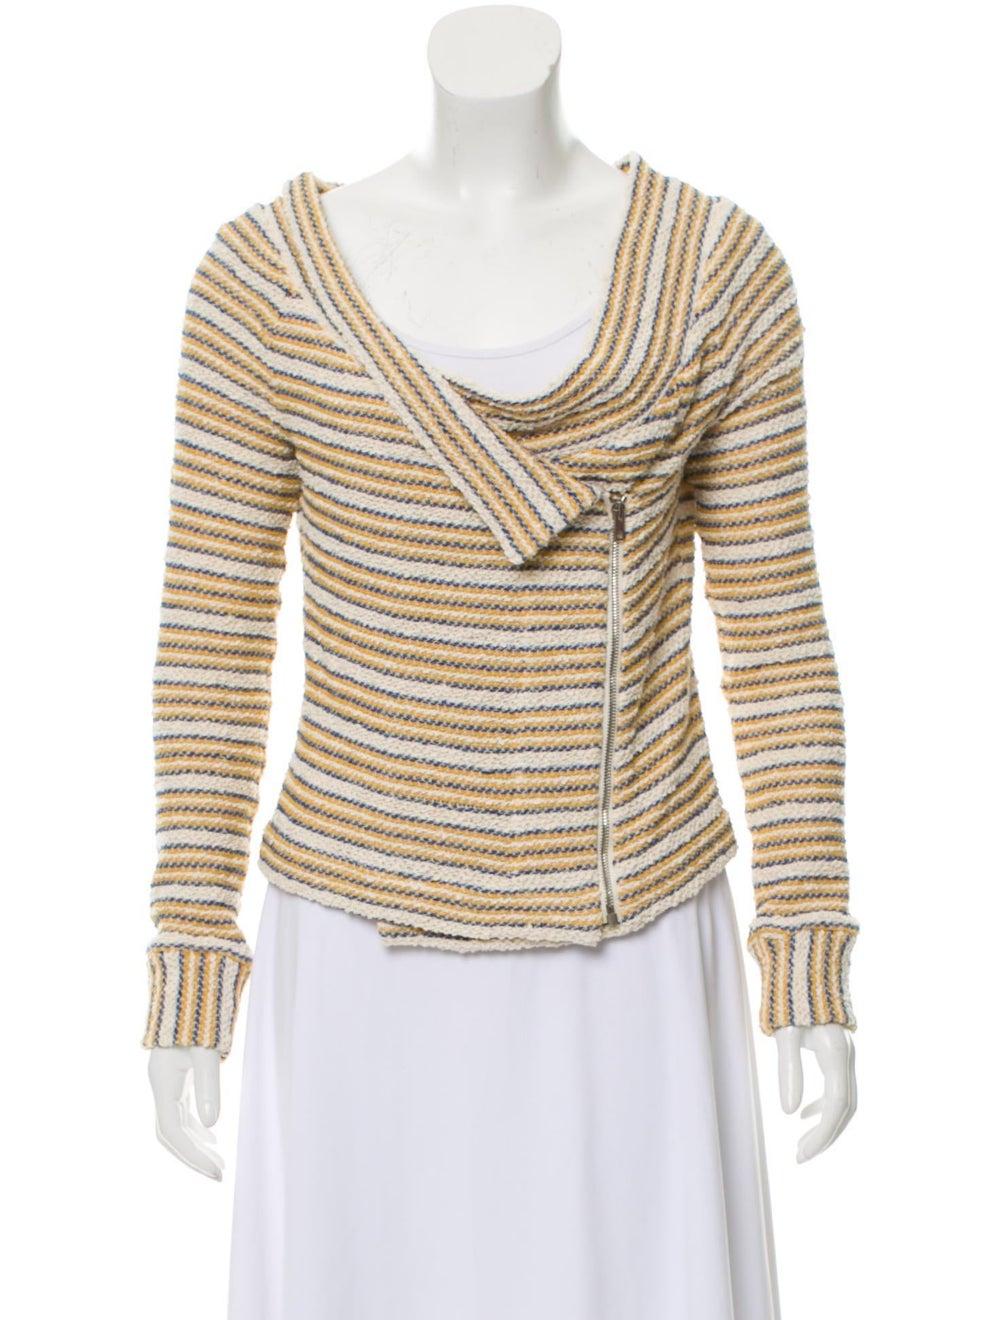 Iro Striped Tweed Jacket - image 1